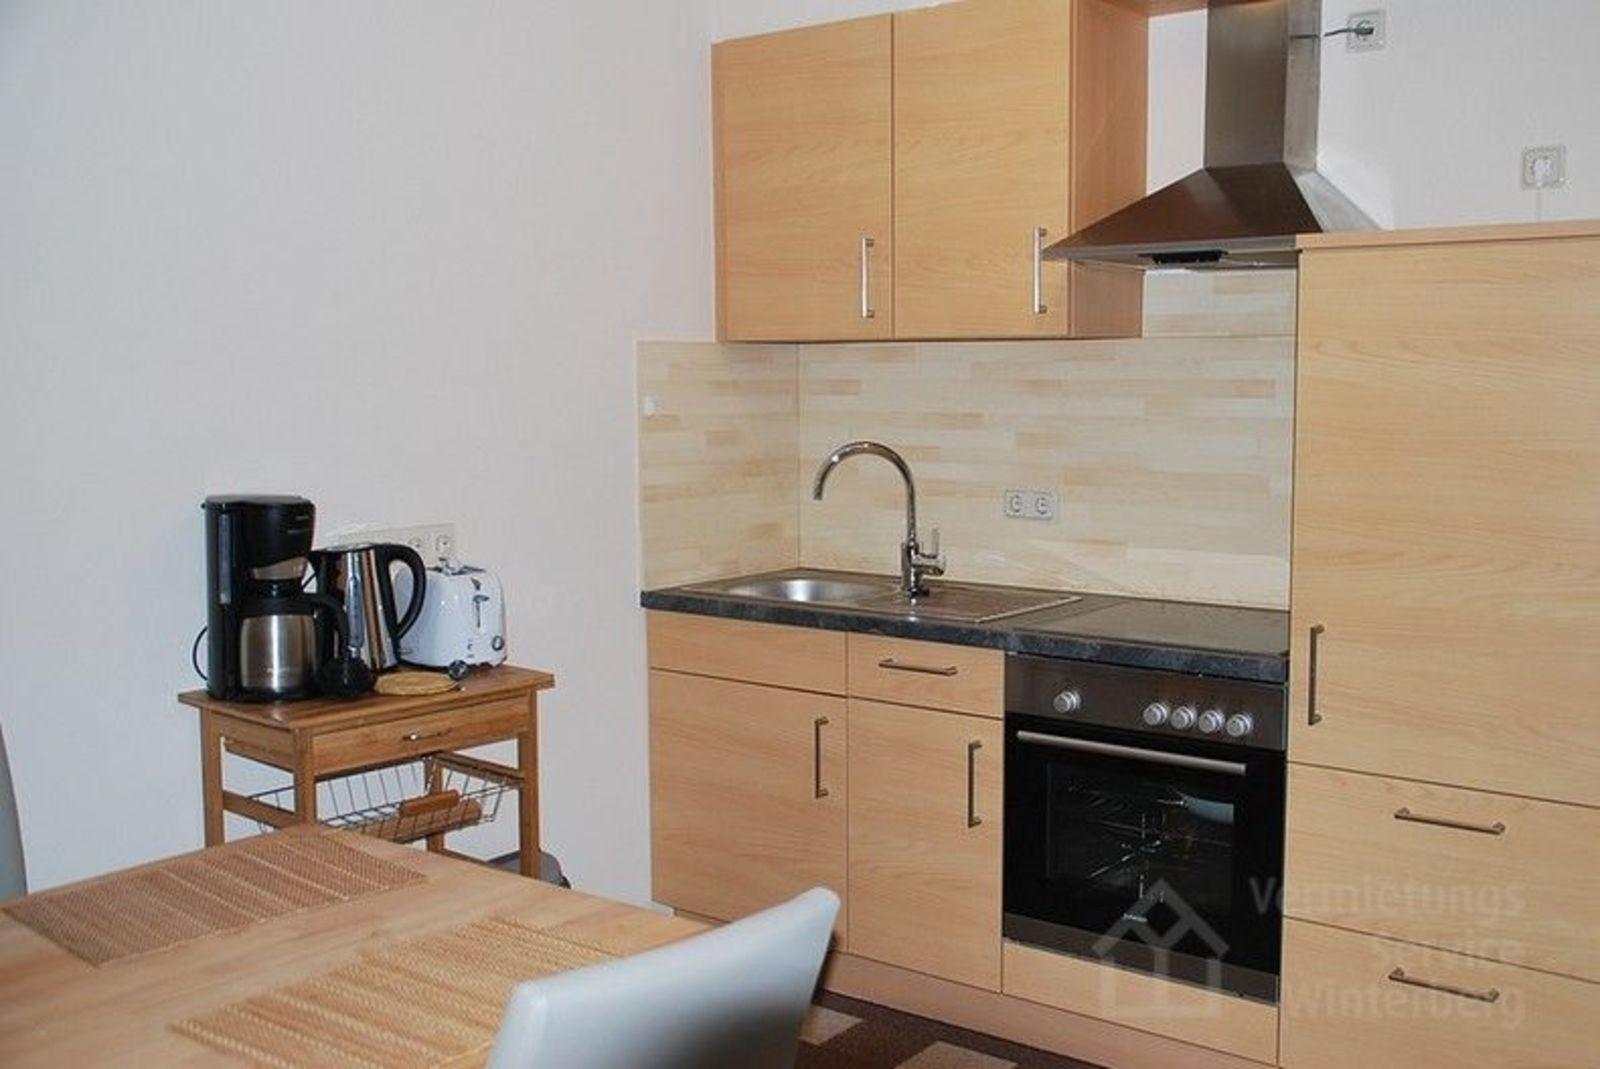 Appartement - Feldstraße 40-C  | Winterberg